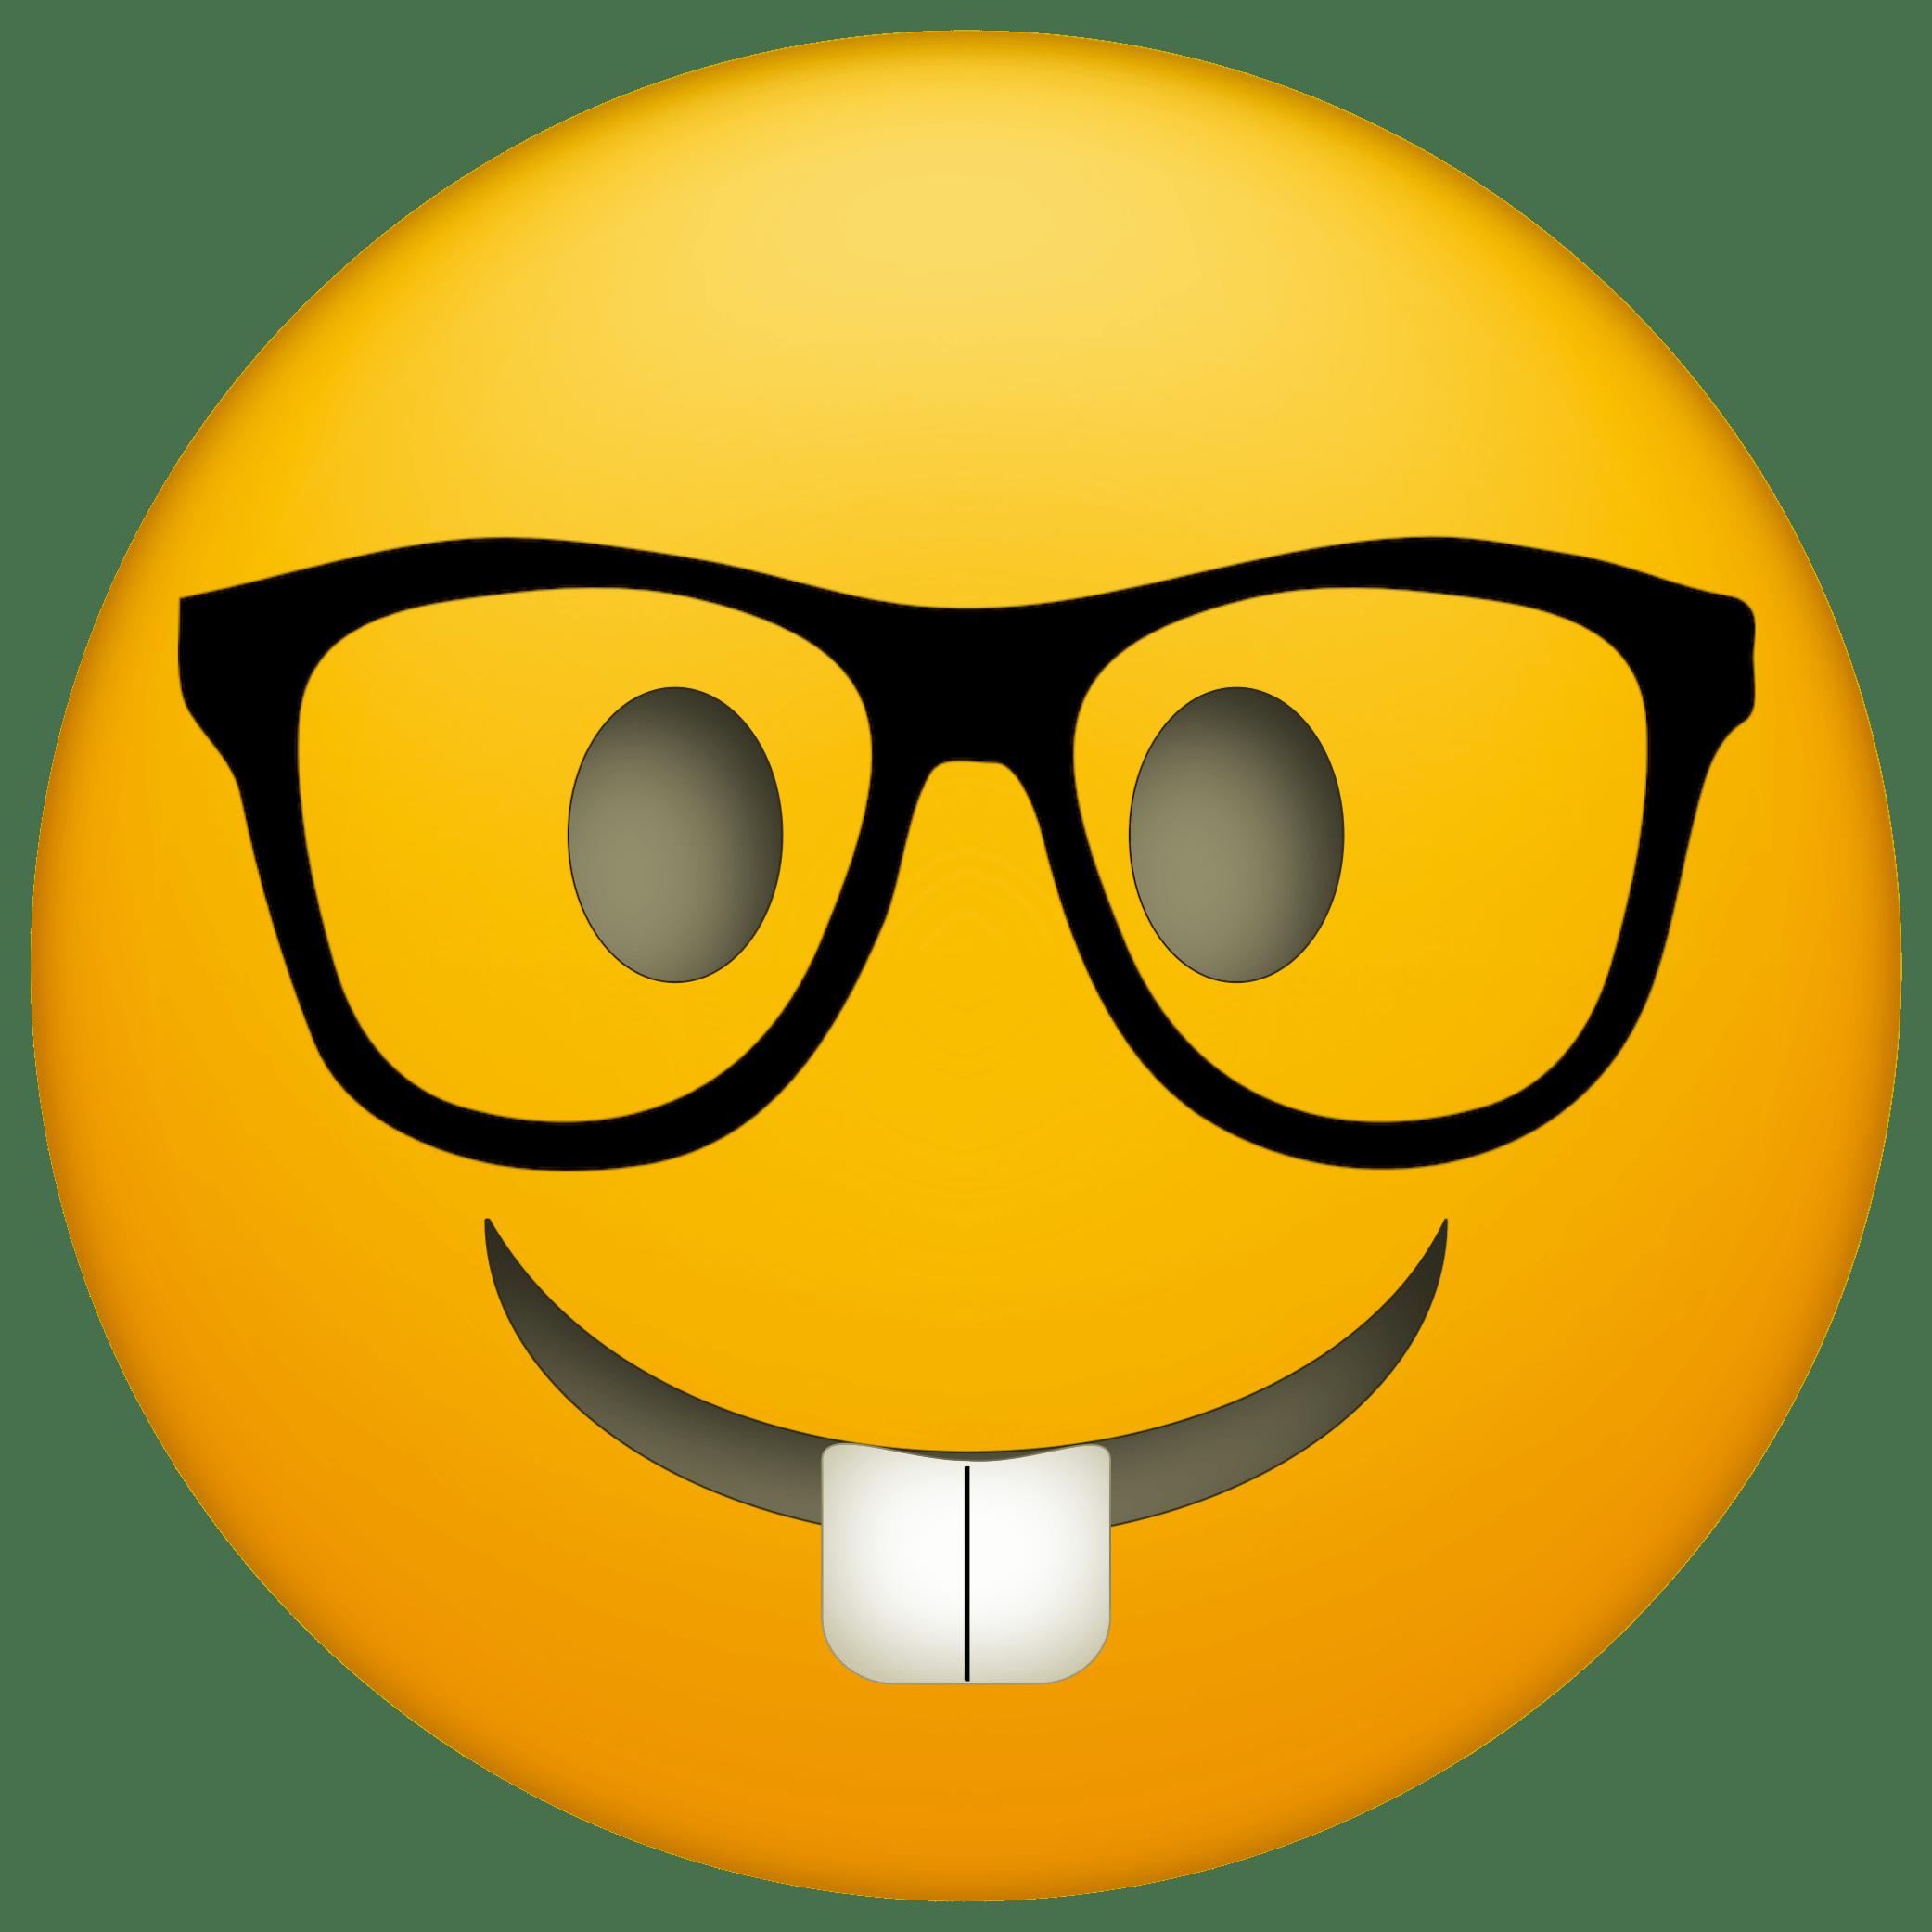 Emoji nerd glasses png. Glass clipart face